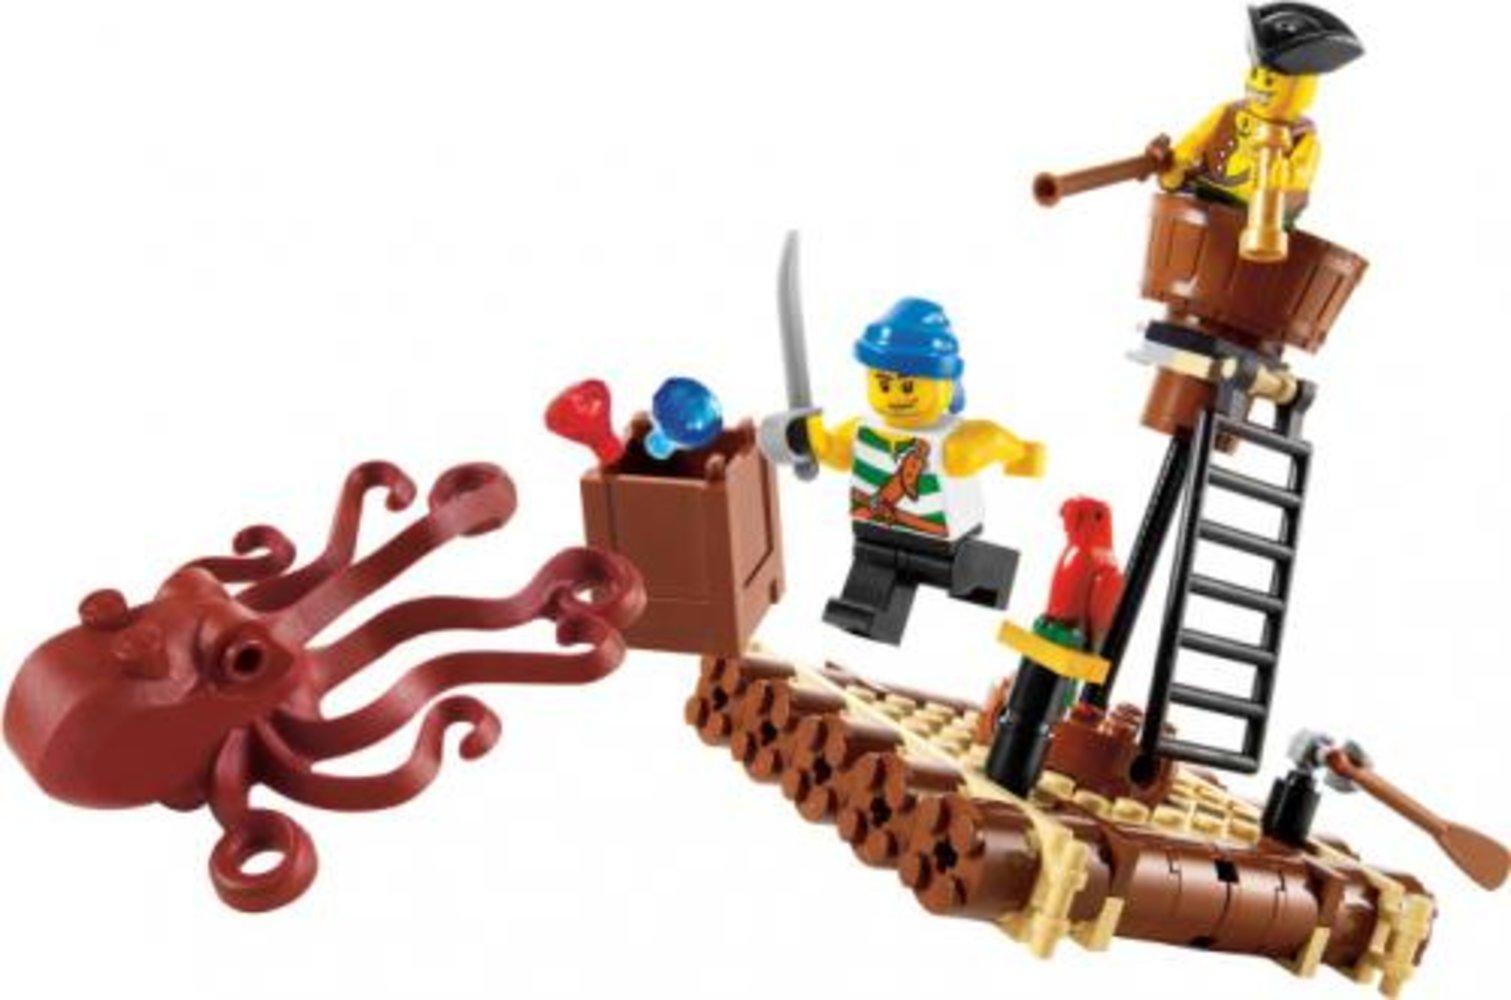 Kraken Attackin'